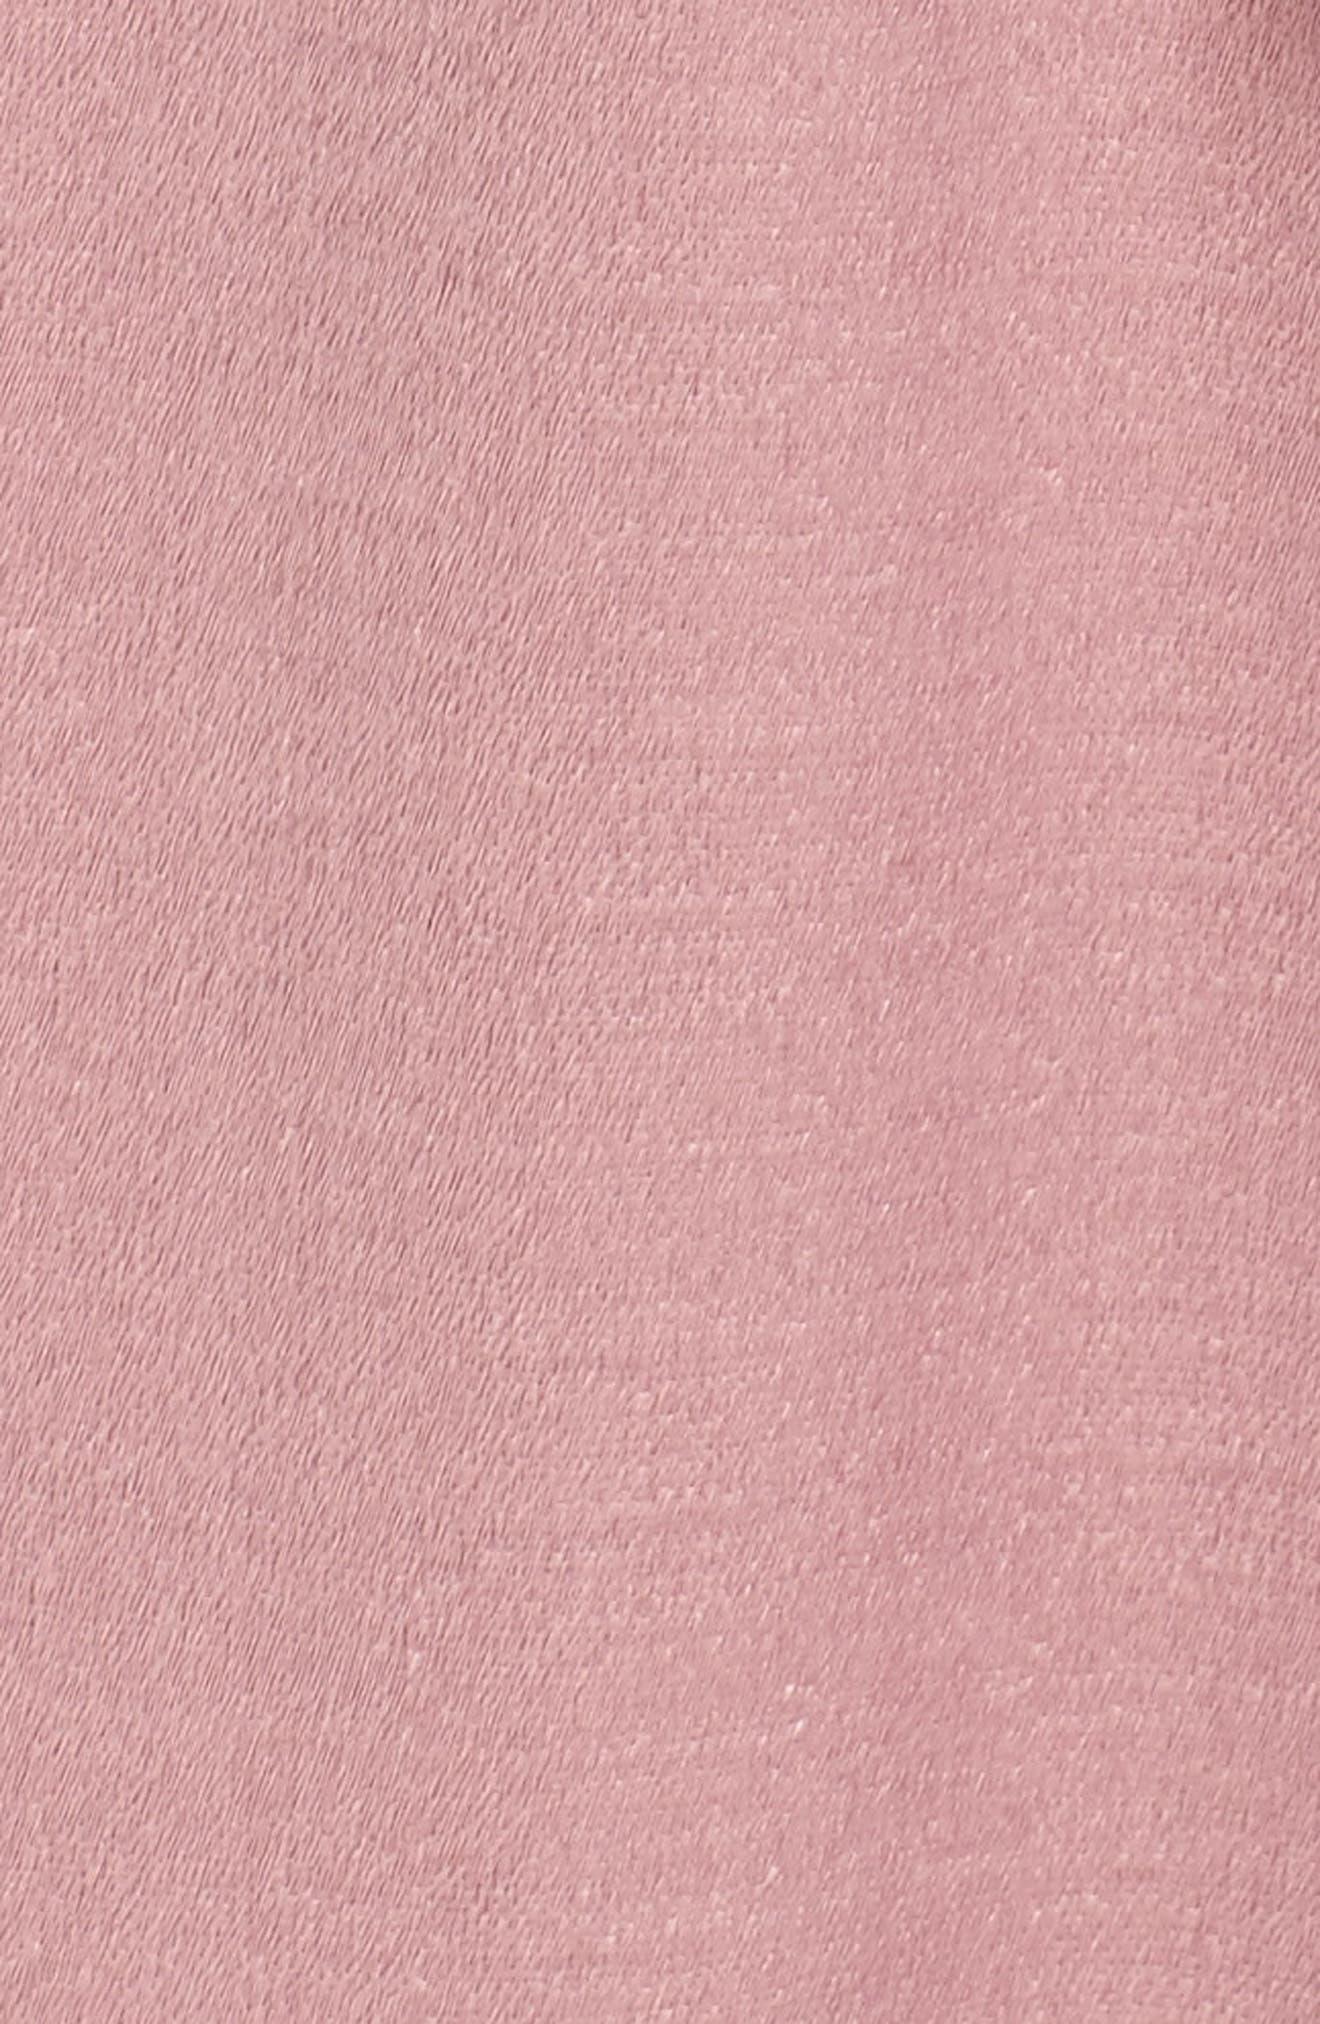 Cold Shoulder A-Line Dress,                             Alternate thumbnail 5, color,